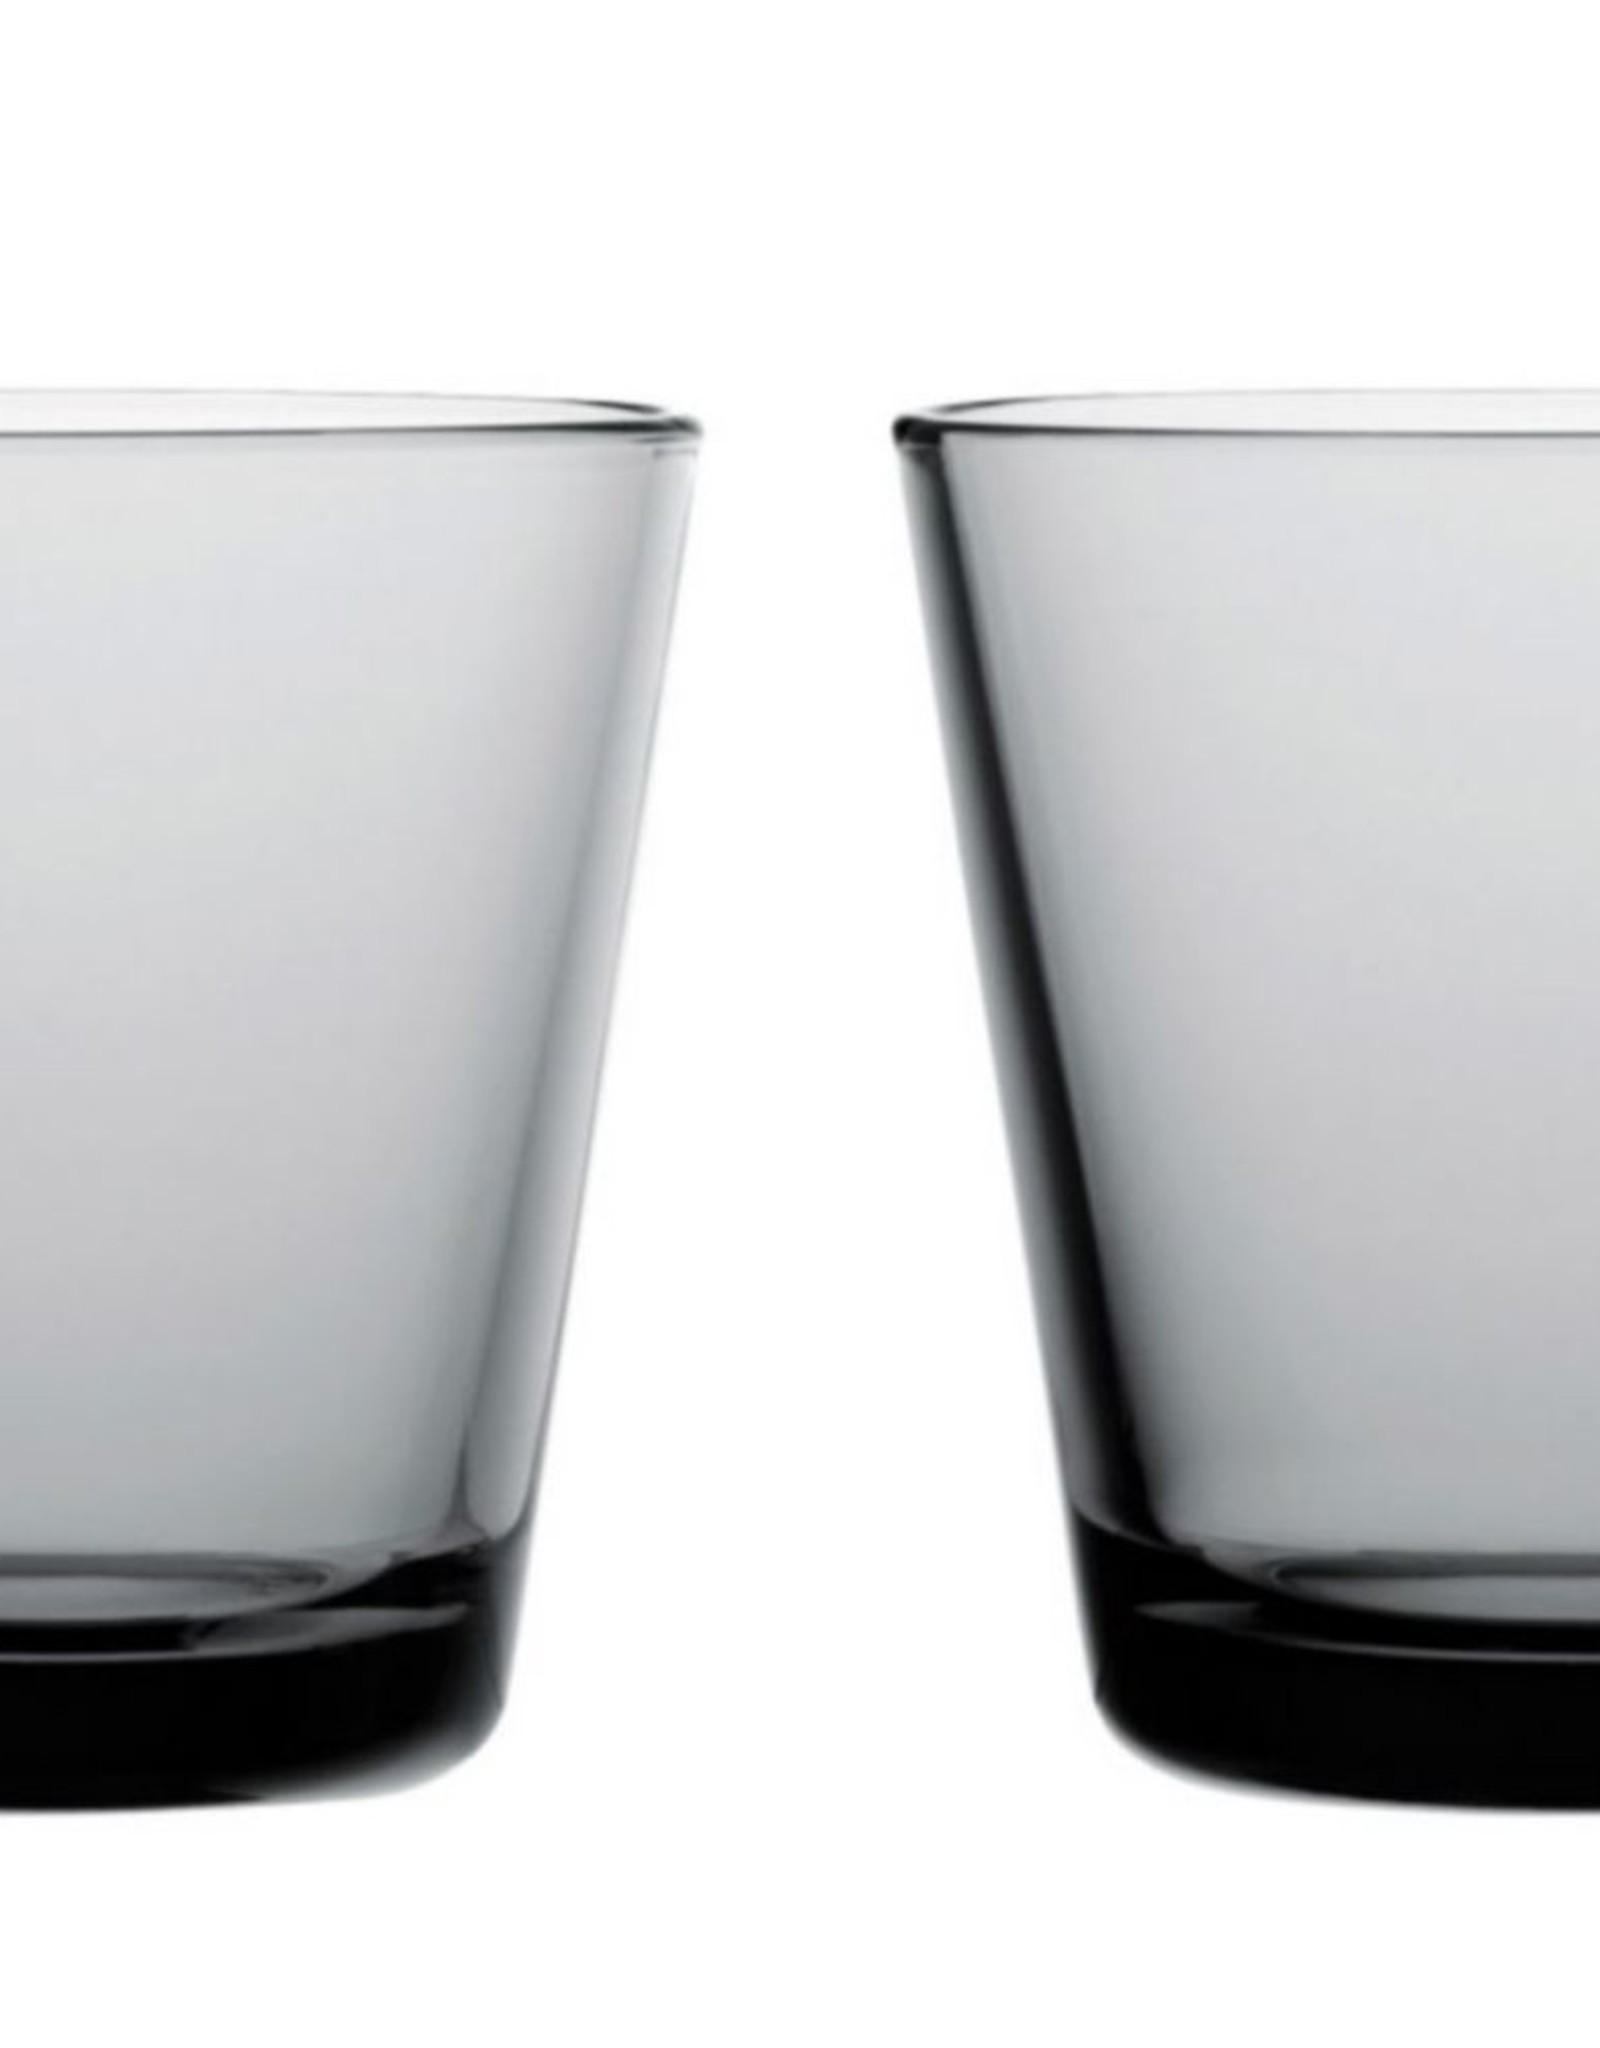 Iittala Iittala Kartio Glas - 21 cl - Grijs - 2 stuks